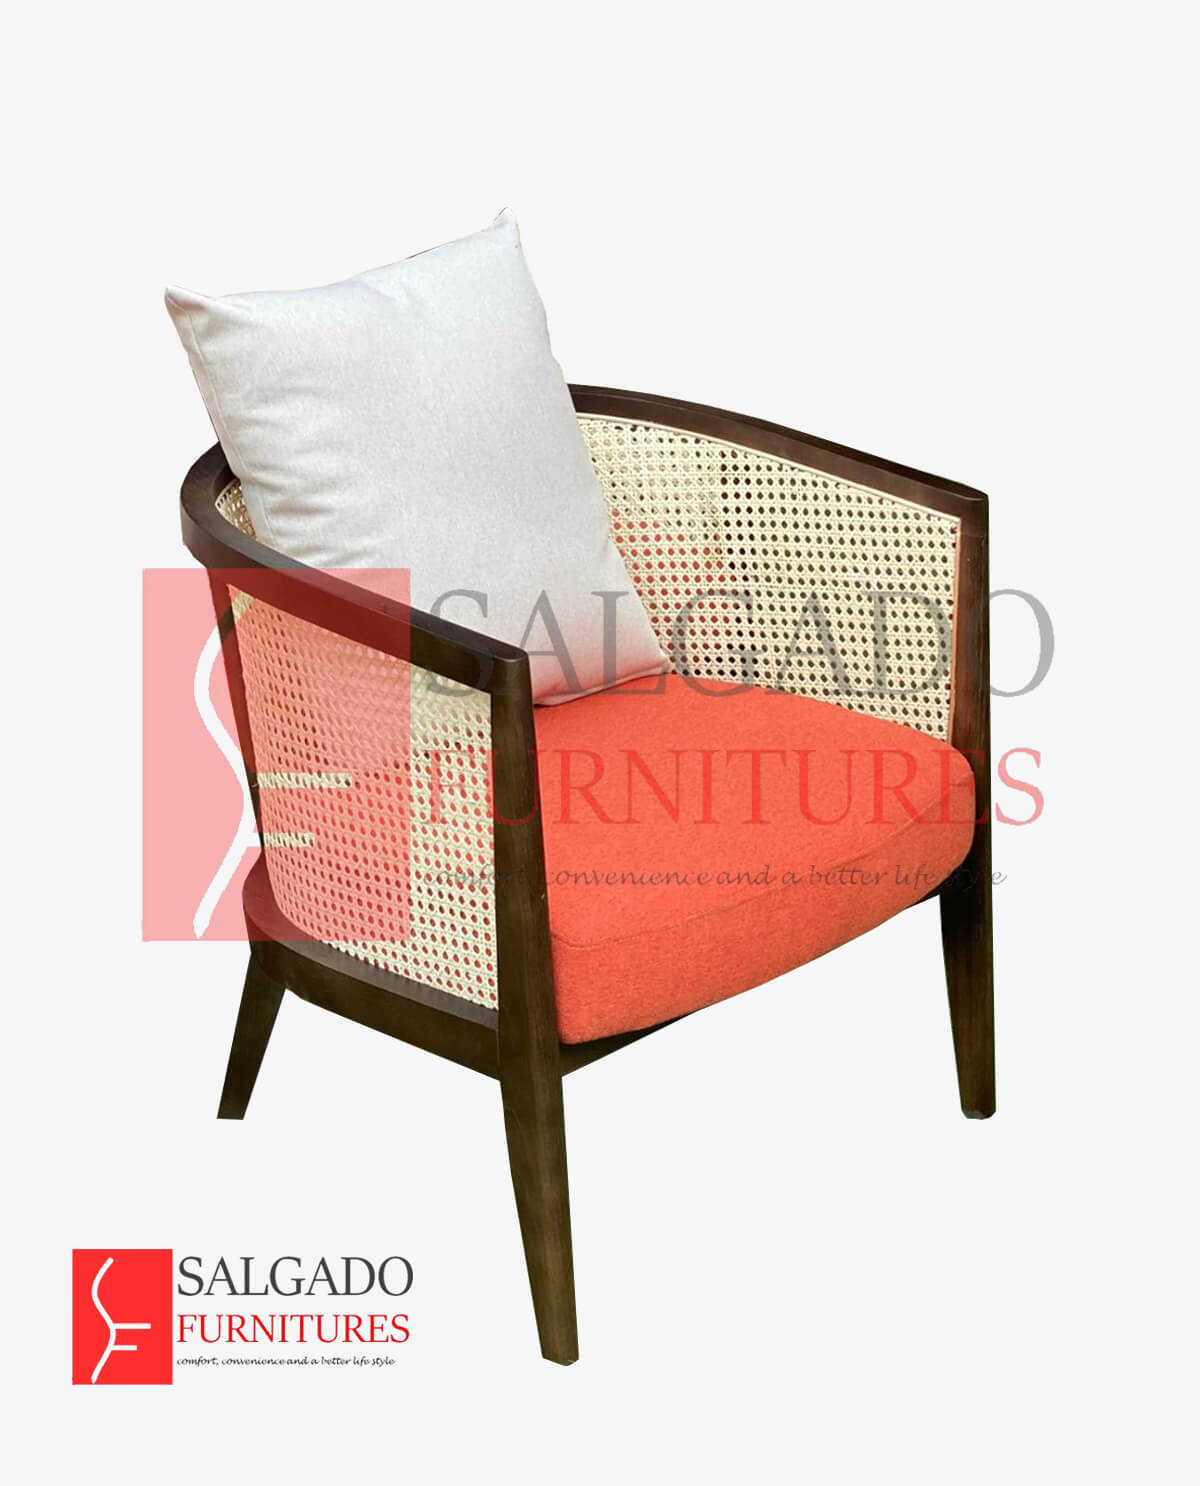 Banana-white-pillow-rattan-chair-srilanka